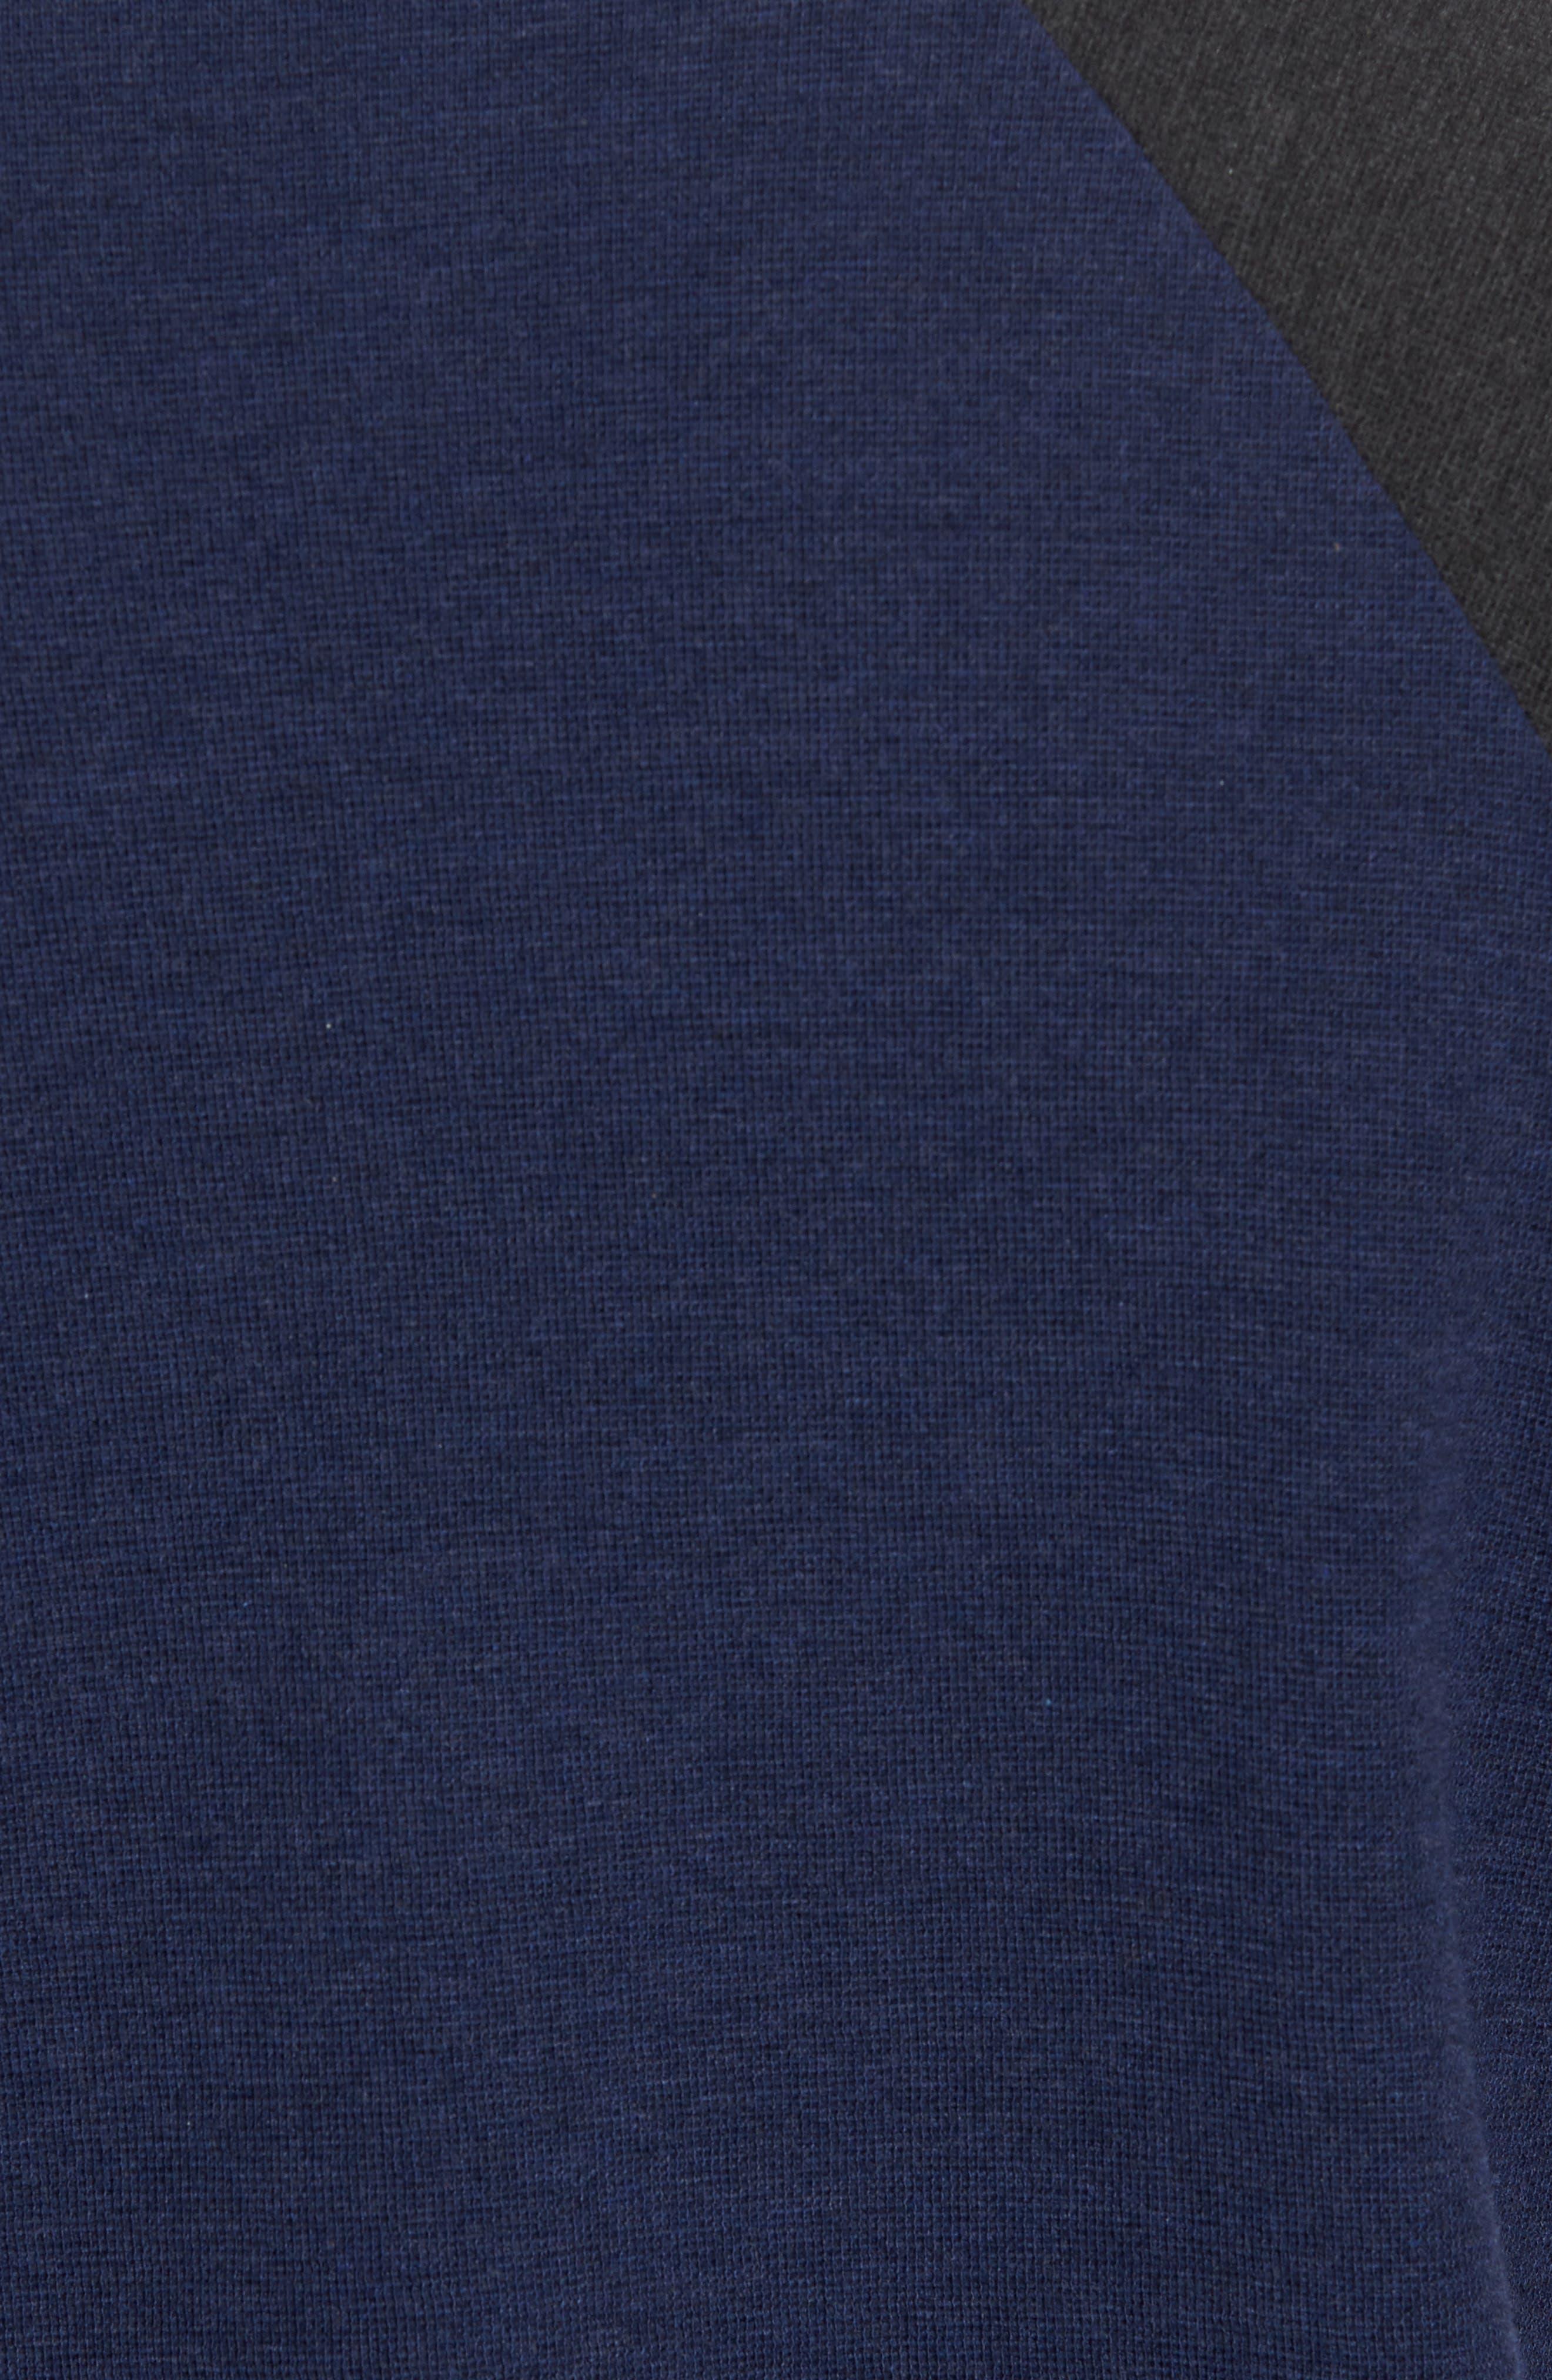 Thermal Knit Raglan Sweatshirt,                             Alternate thumbnail 5, color,                             Heather Navy/ Heather Charcoal